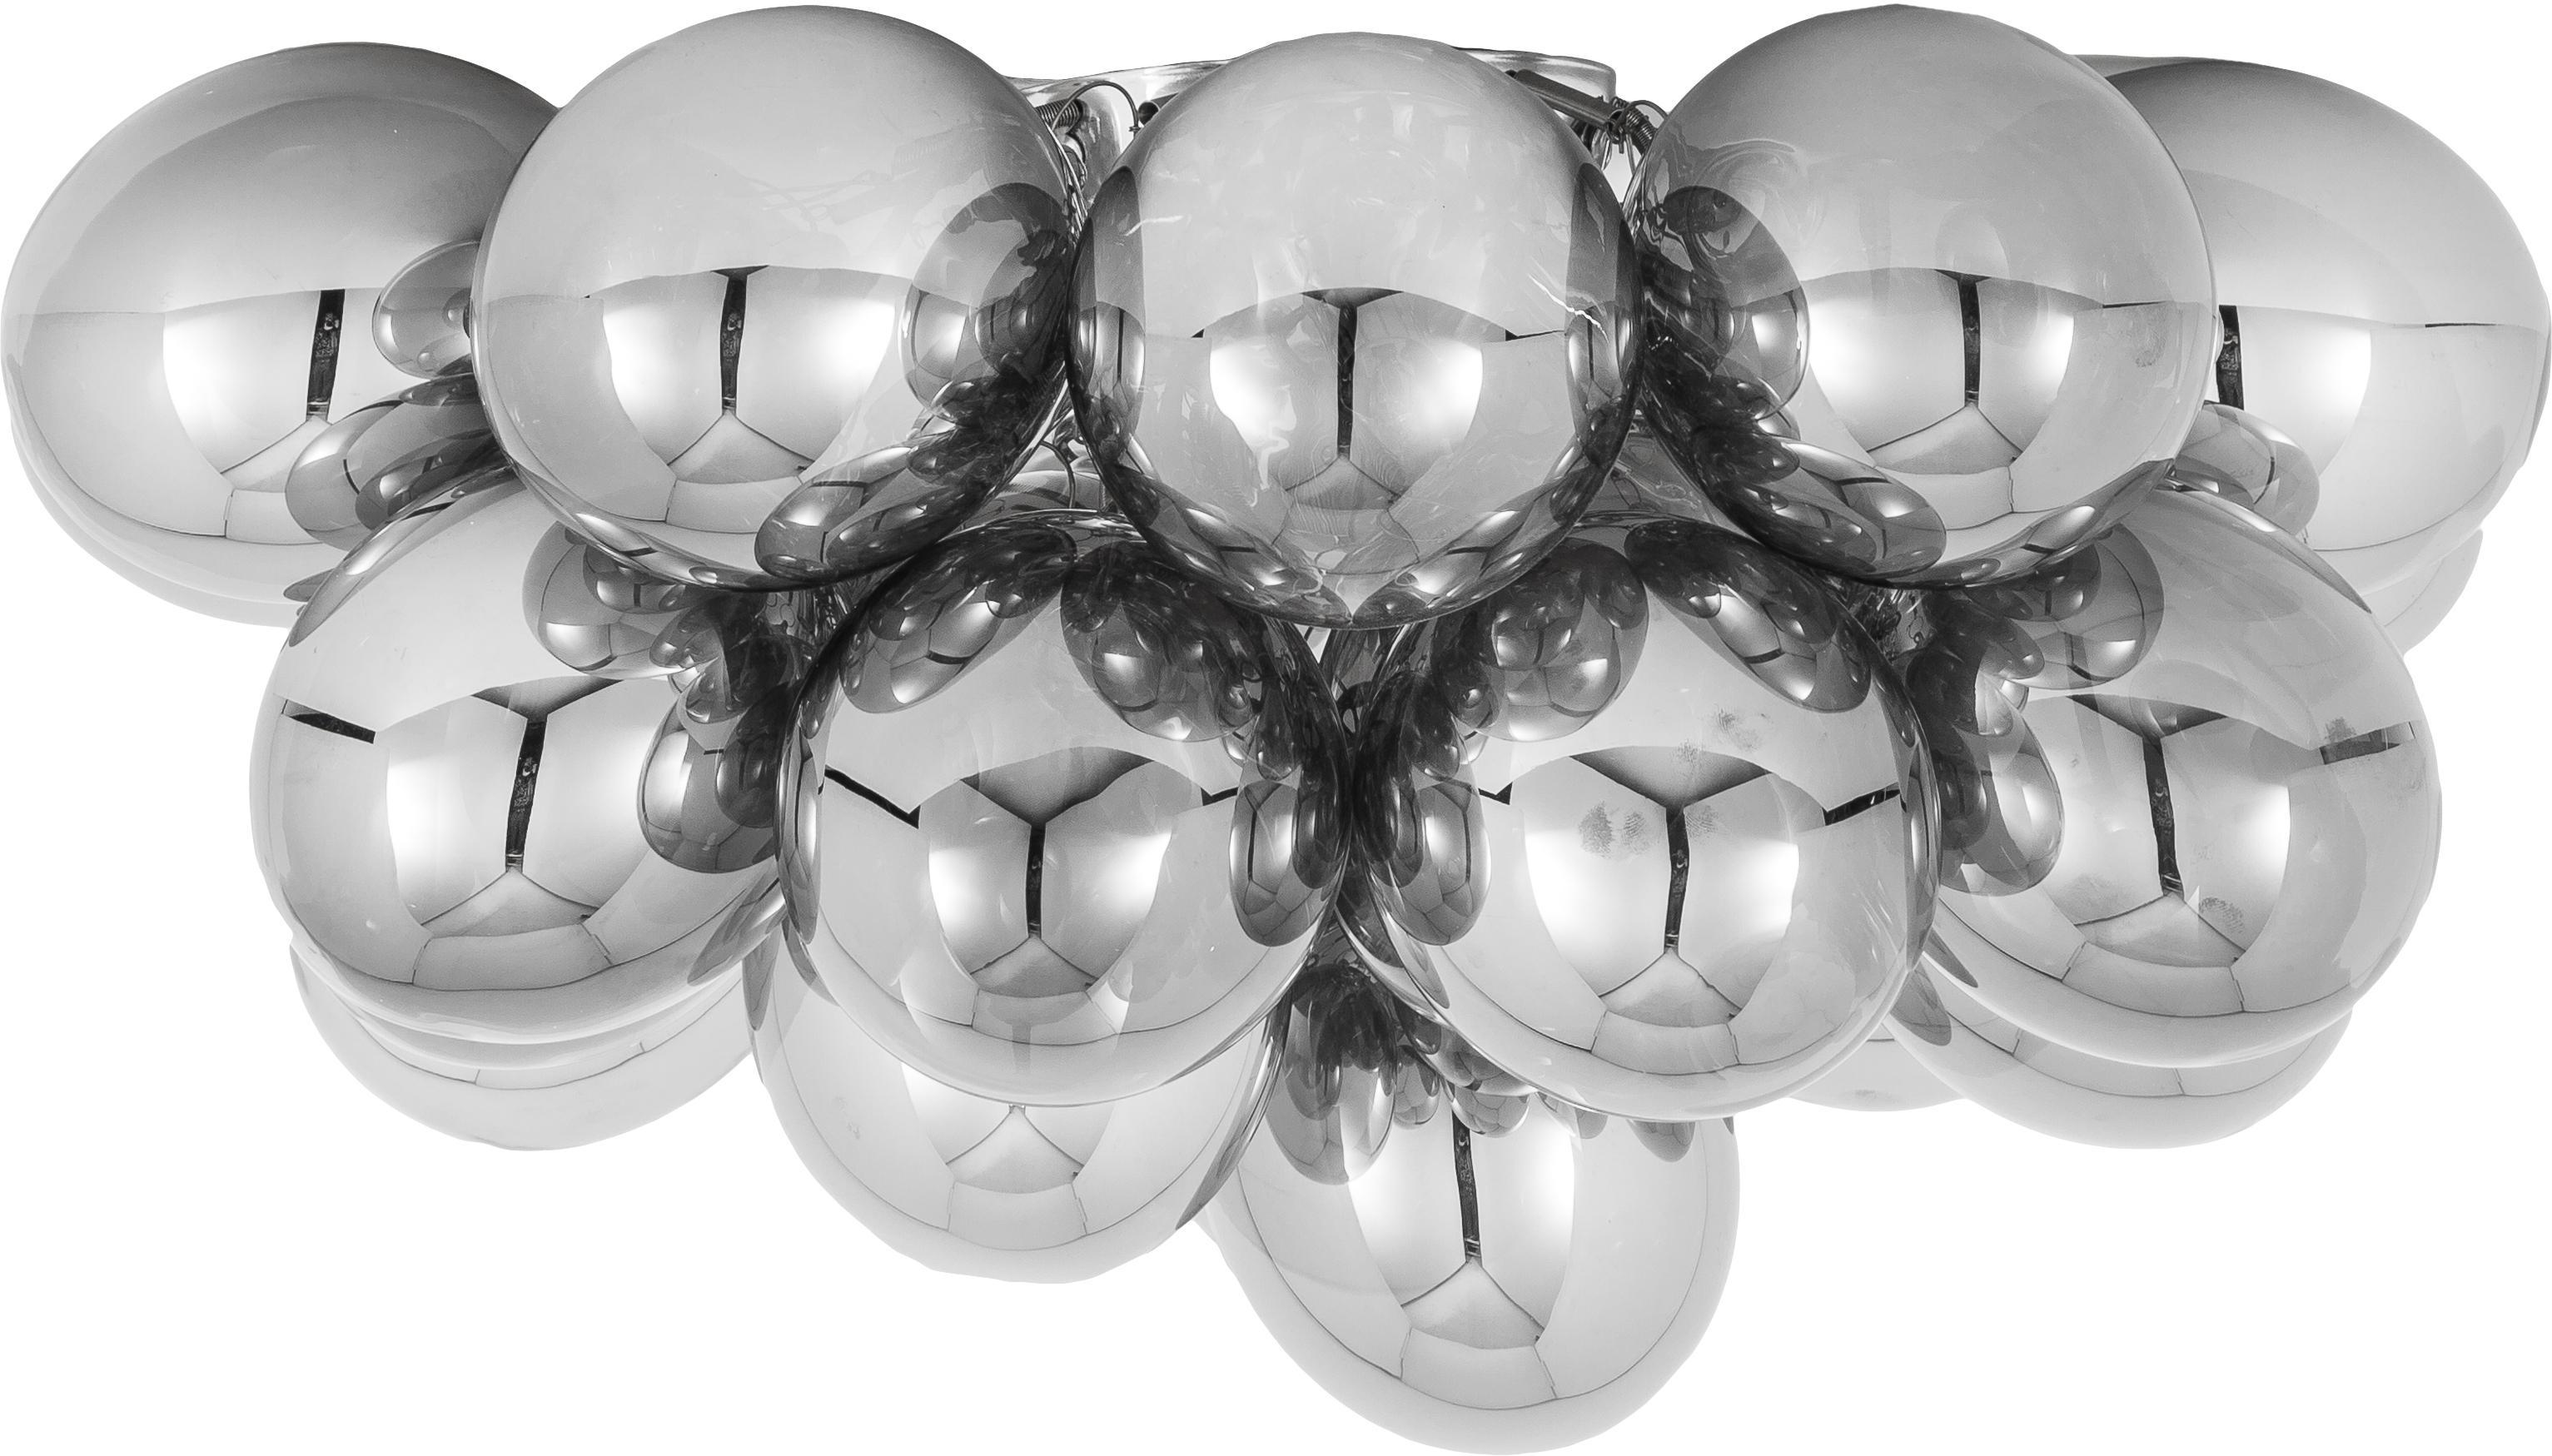 Glaskugel-Deckenleuchte Gross, Chrom, Ø 50 x H 27 cm